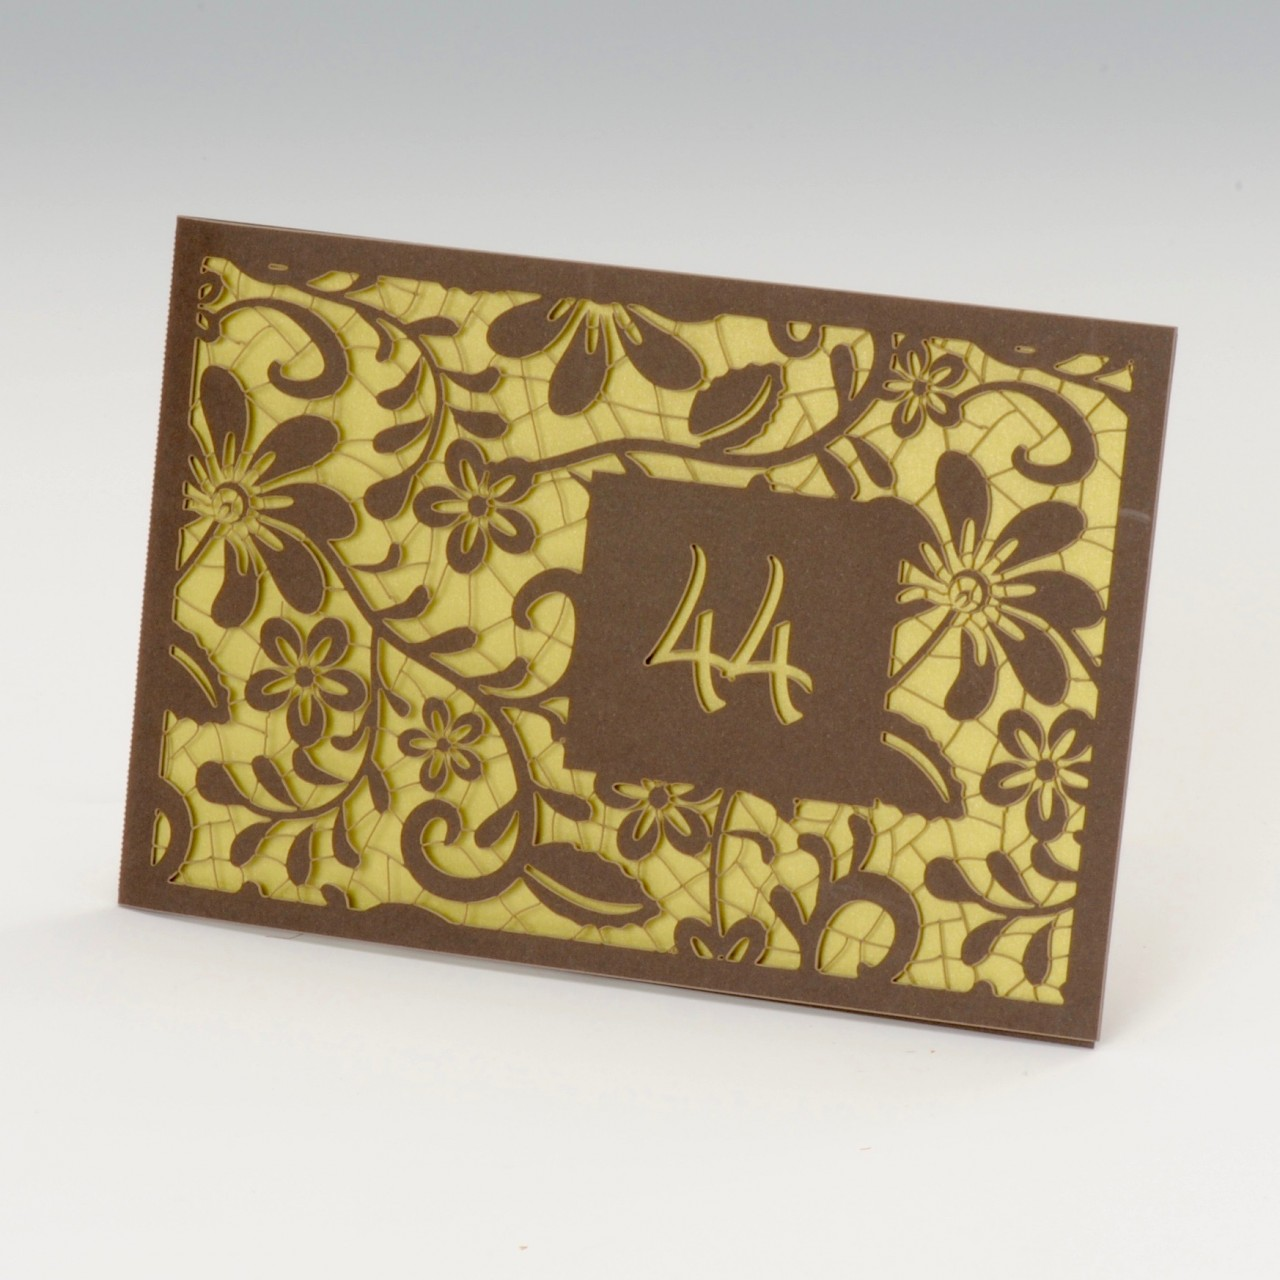 Einladungskarte - A 2106